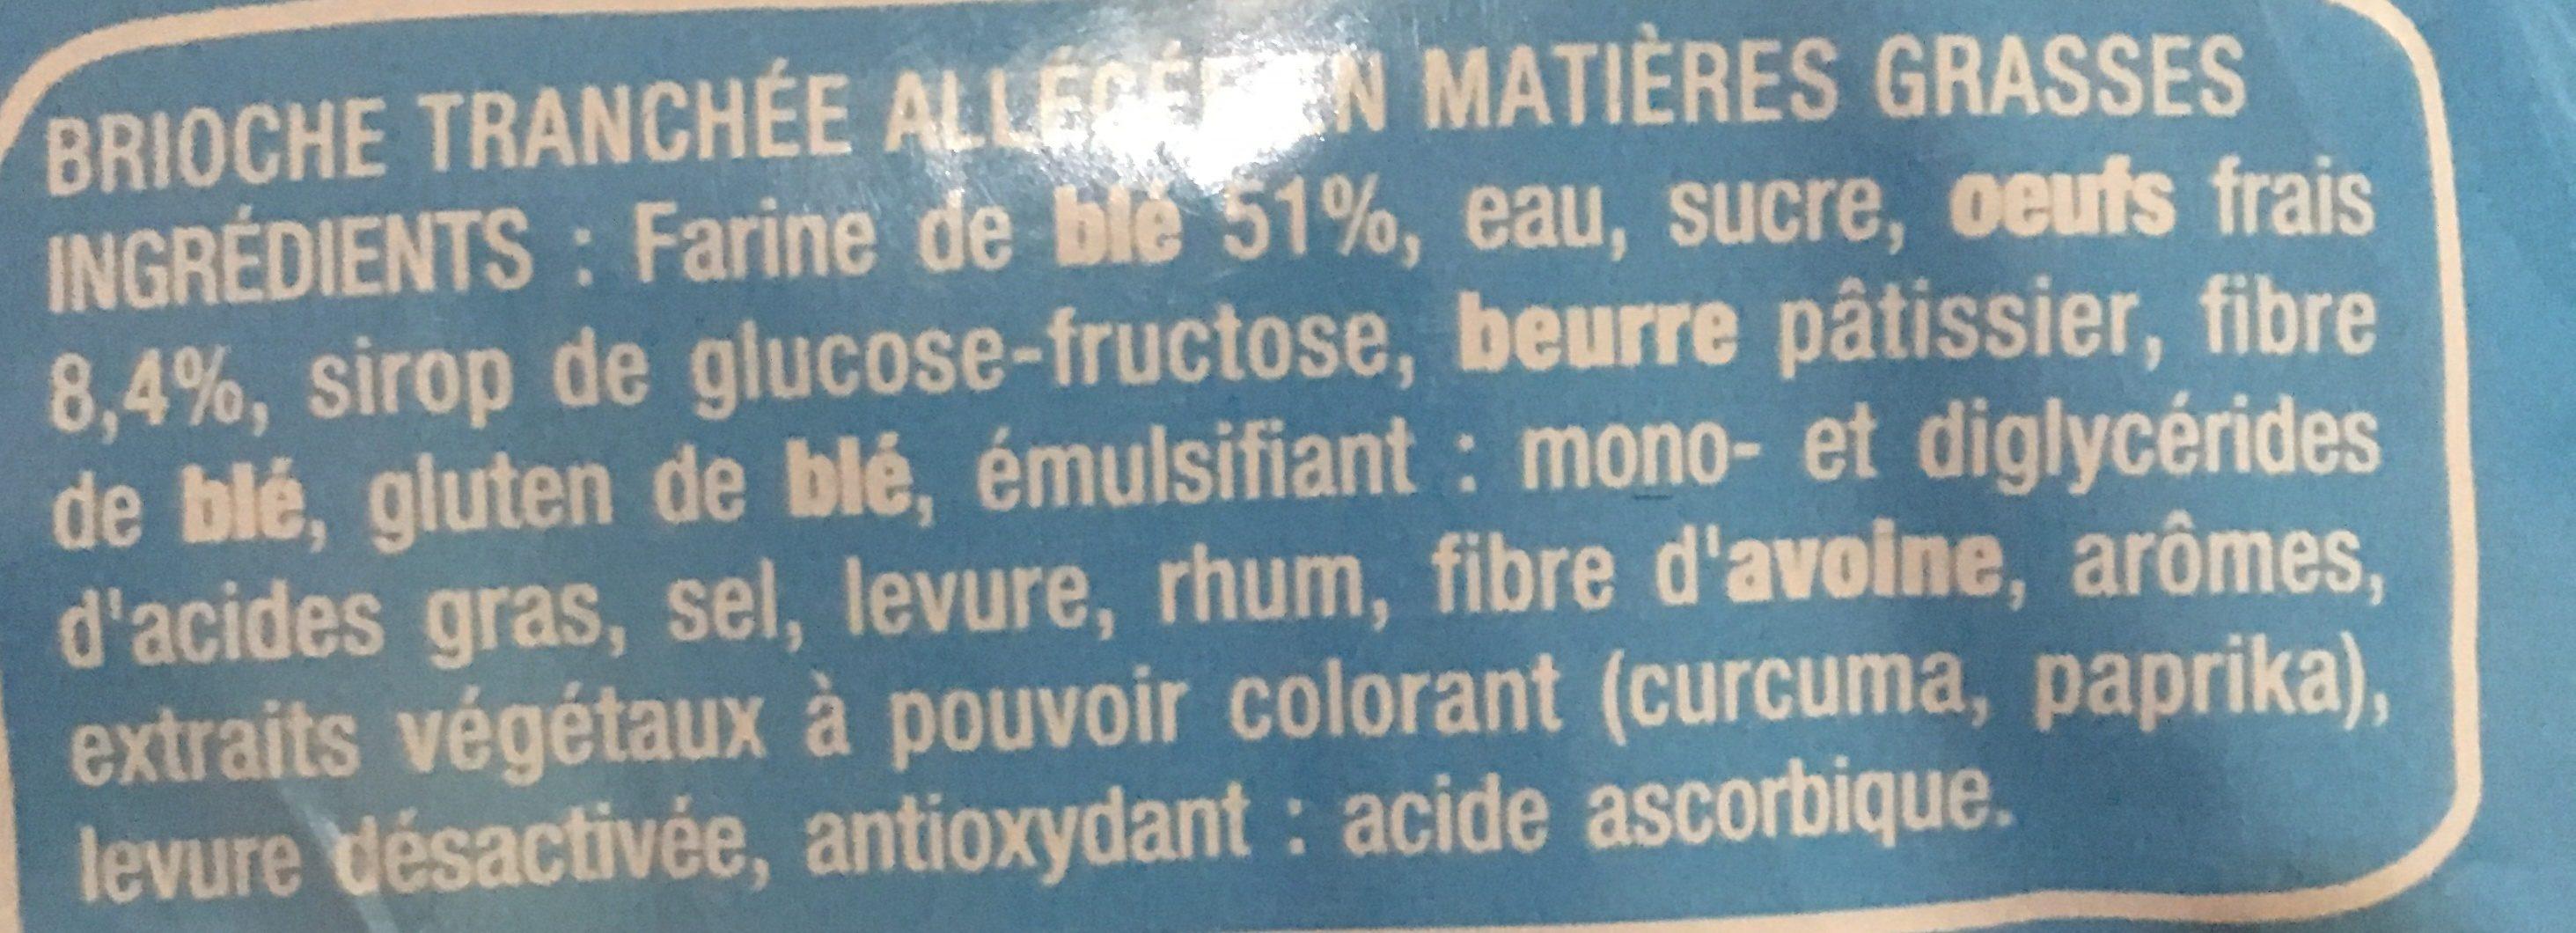 Brioche Tranchée Light - Ingredients - fr